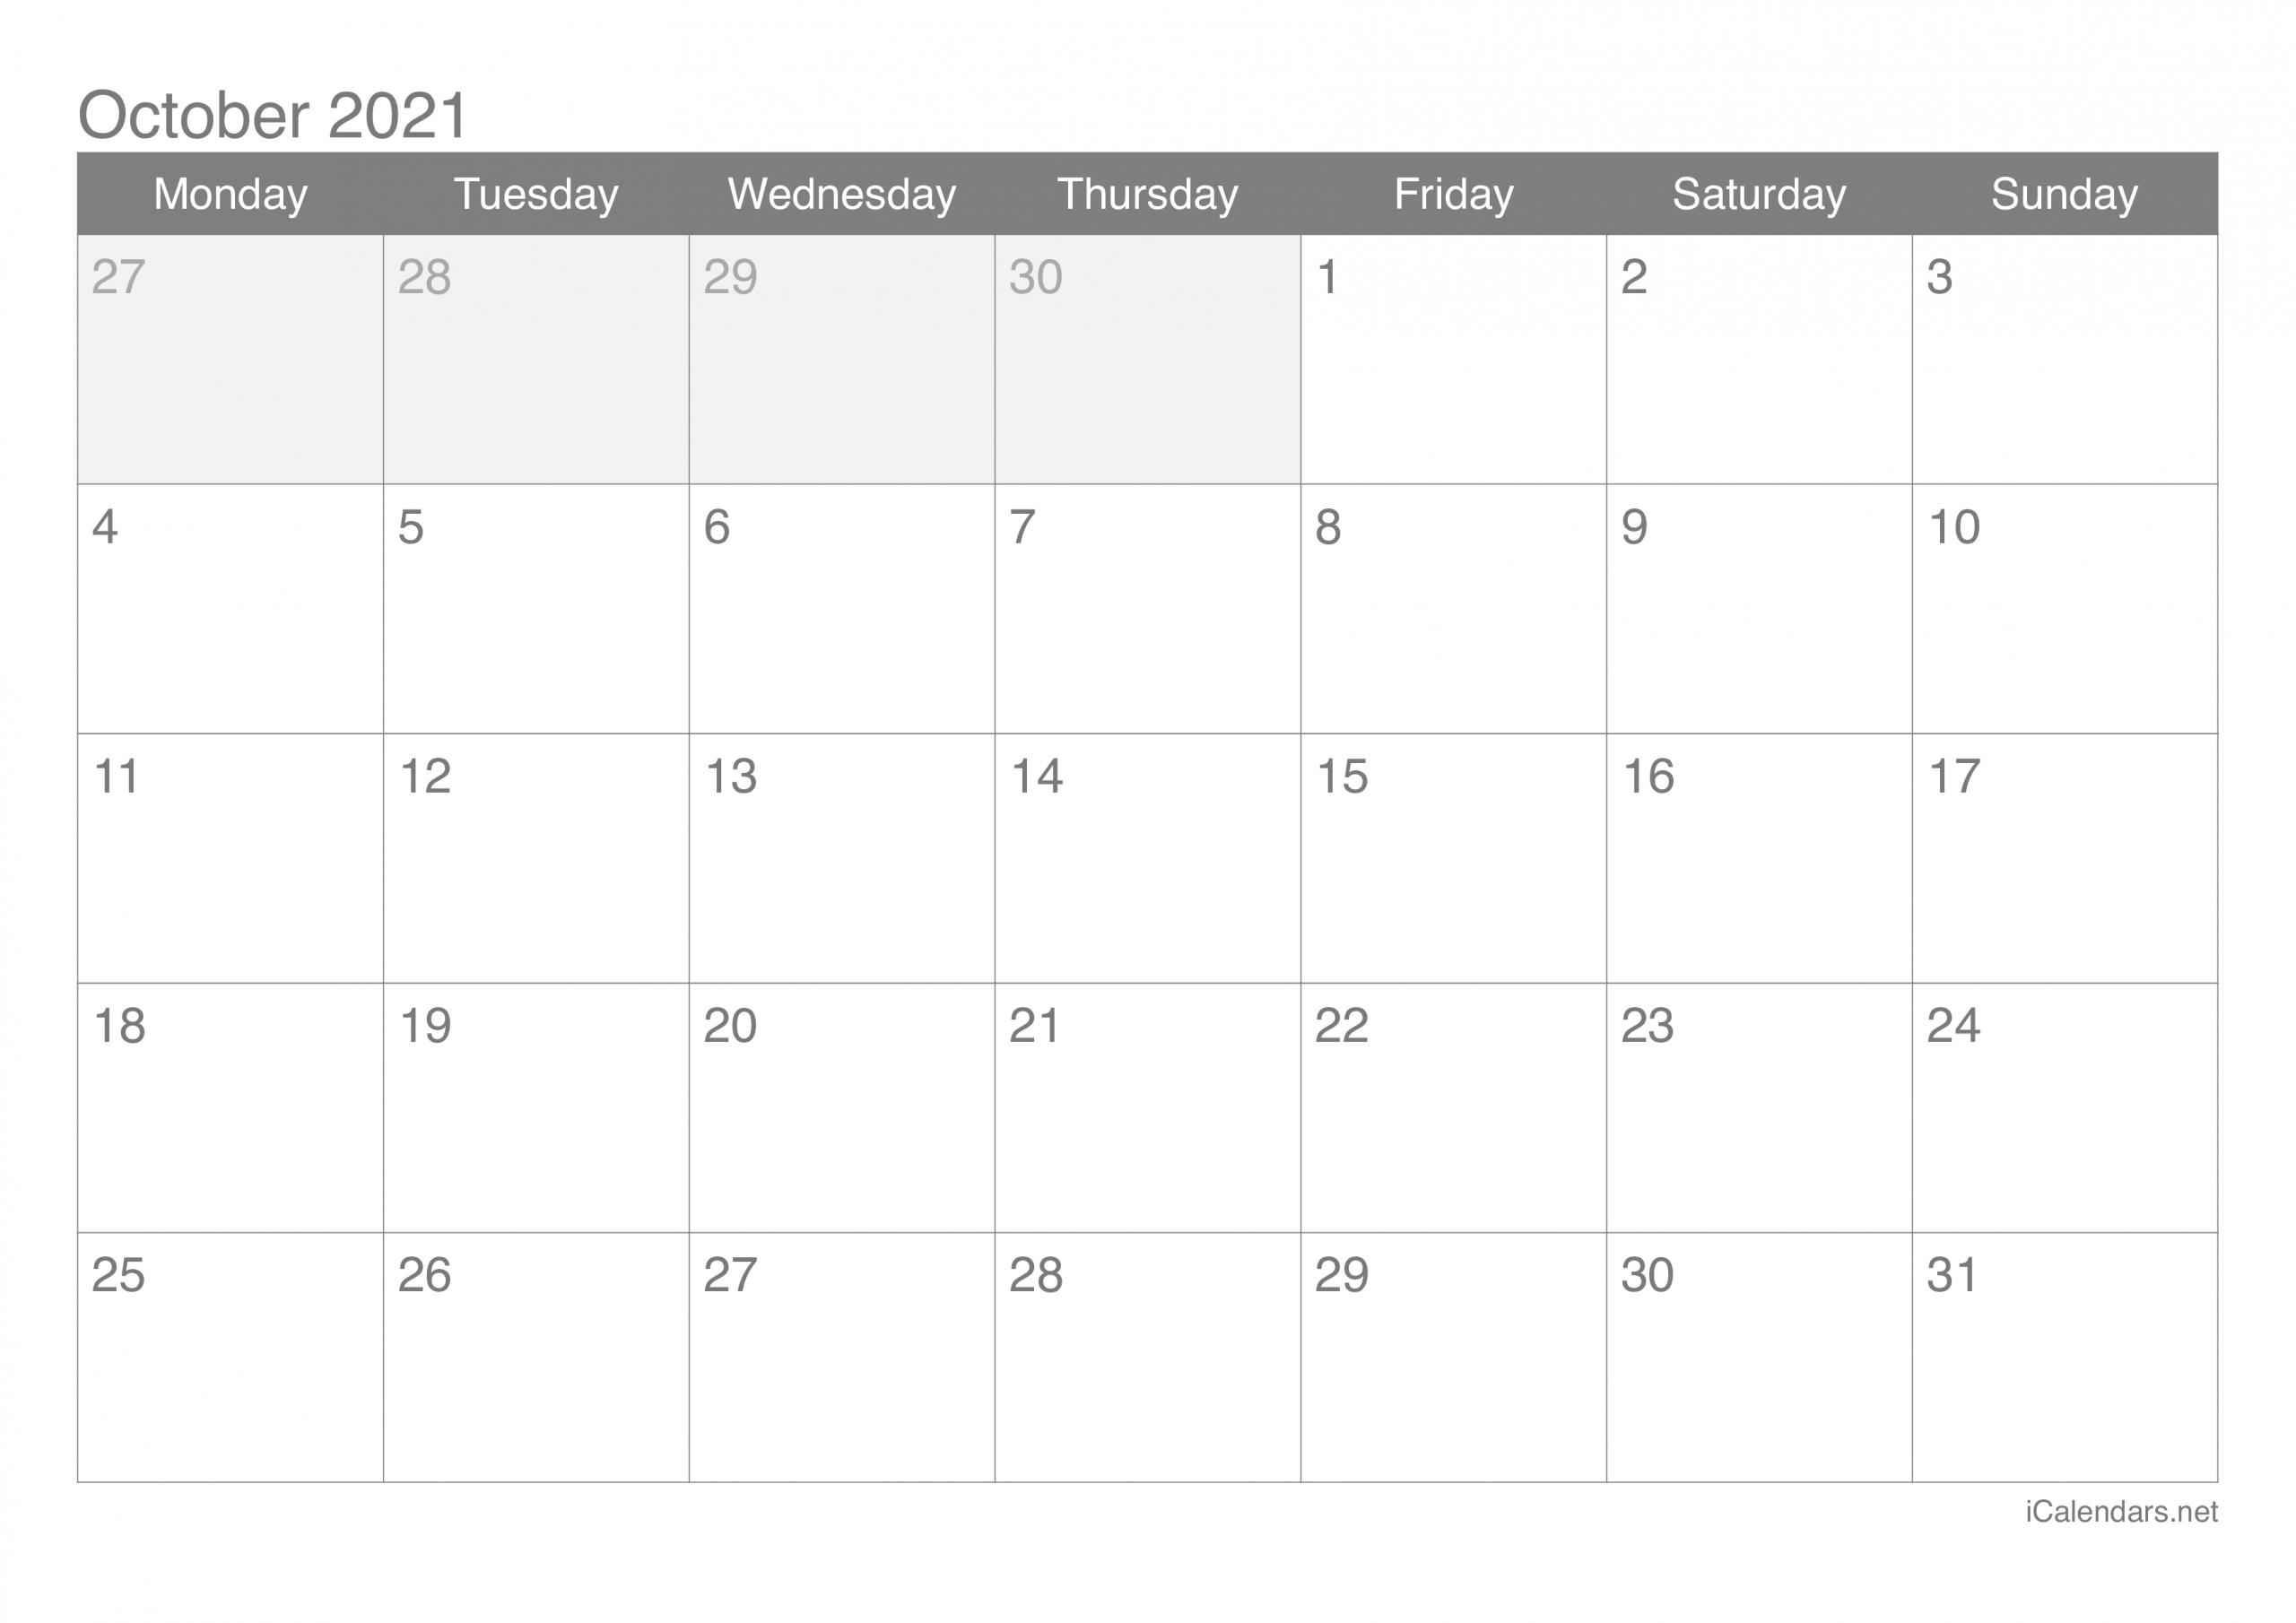 October 2021 Printable Calendar - Icalendars